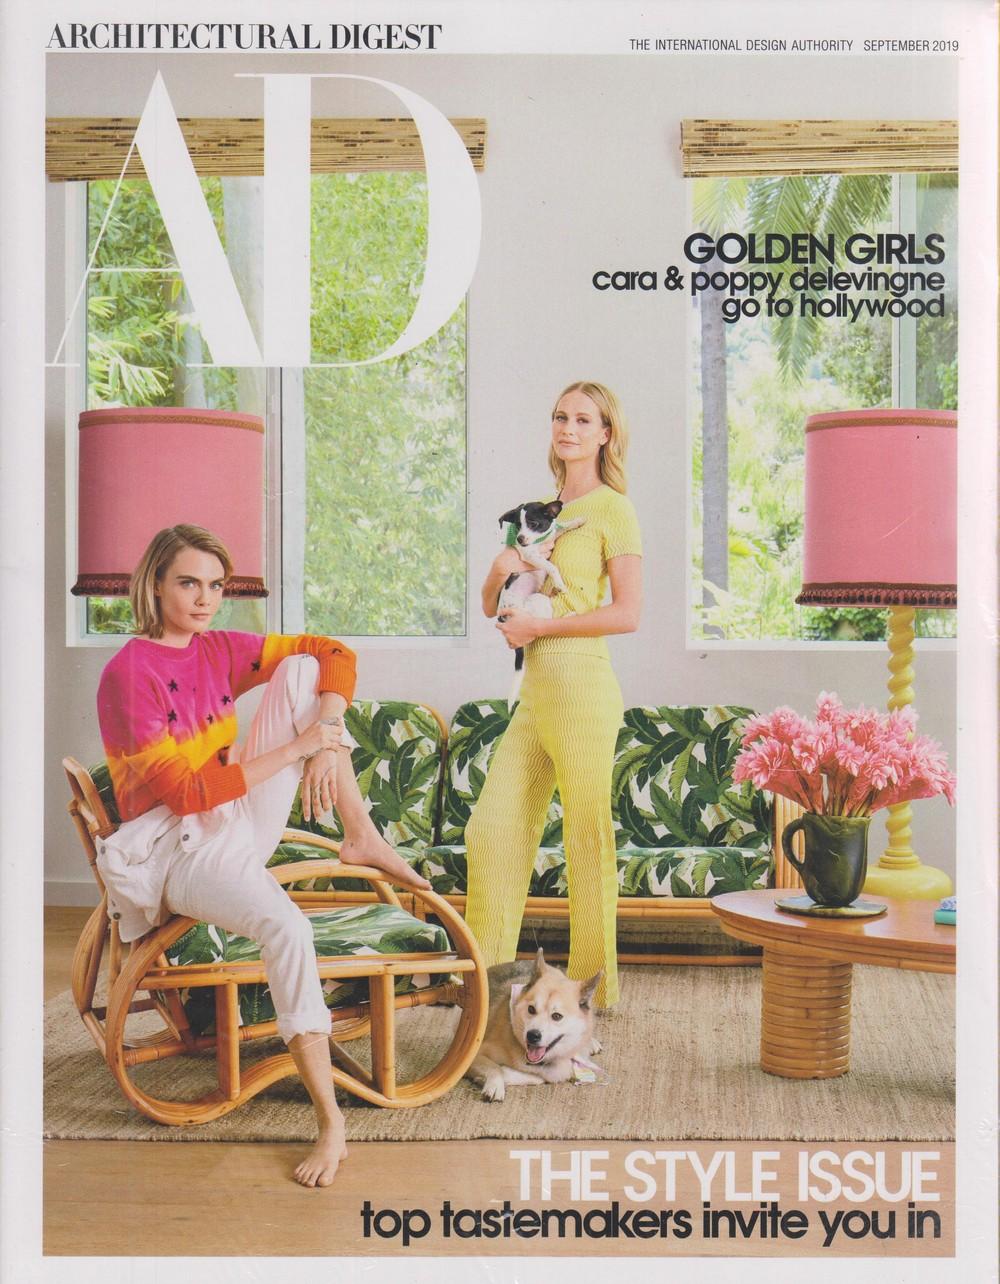 Find The 10 Best Interior Design Magazines For September! interior design magazines Find The 10  Best Interior Design Magazines For September! Find The 10 Best Interior Design Magazines For September 6